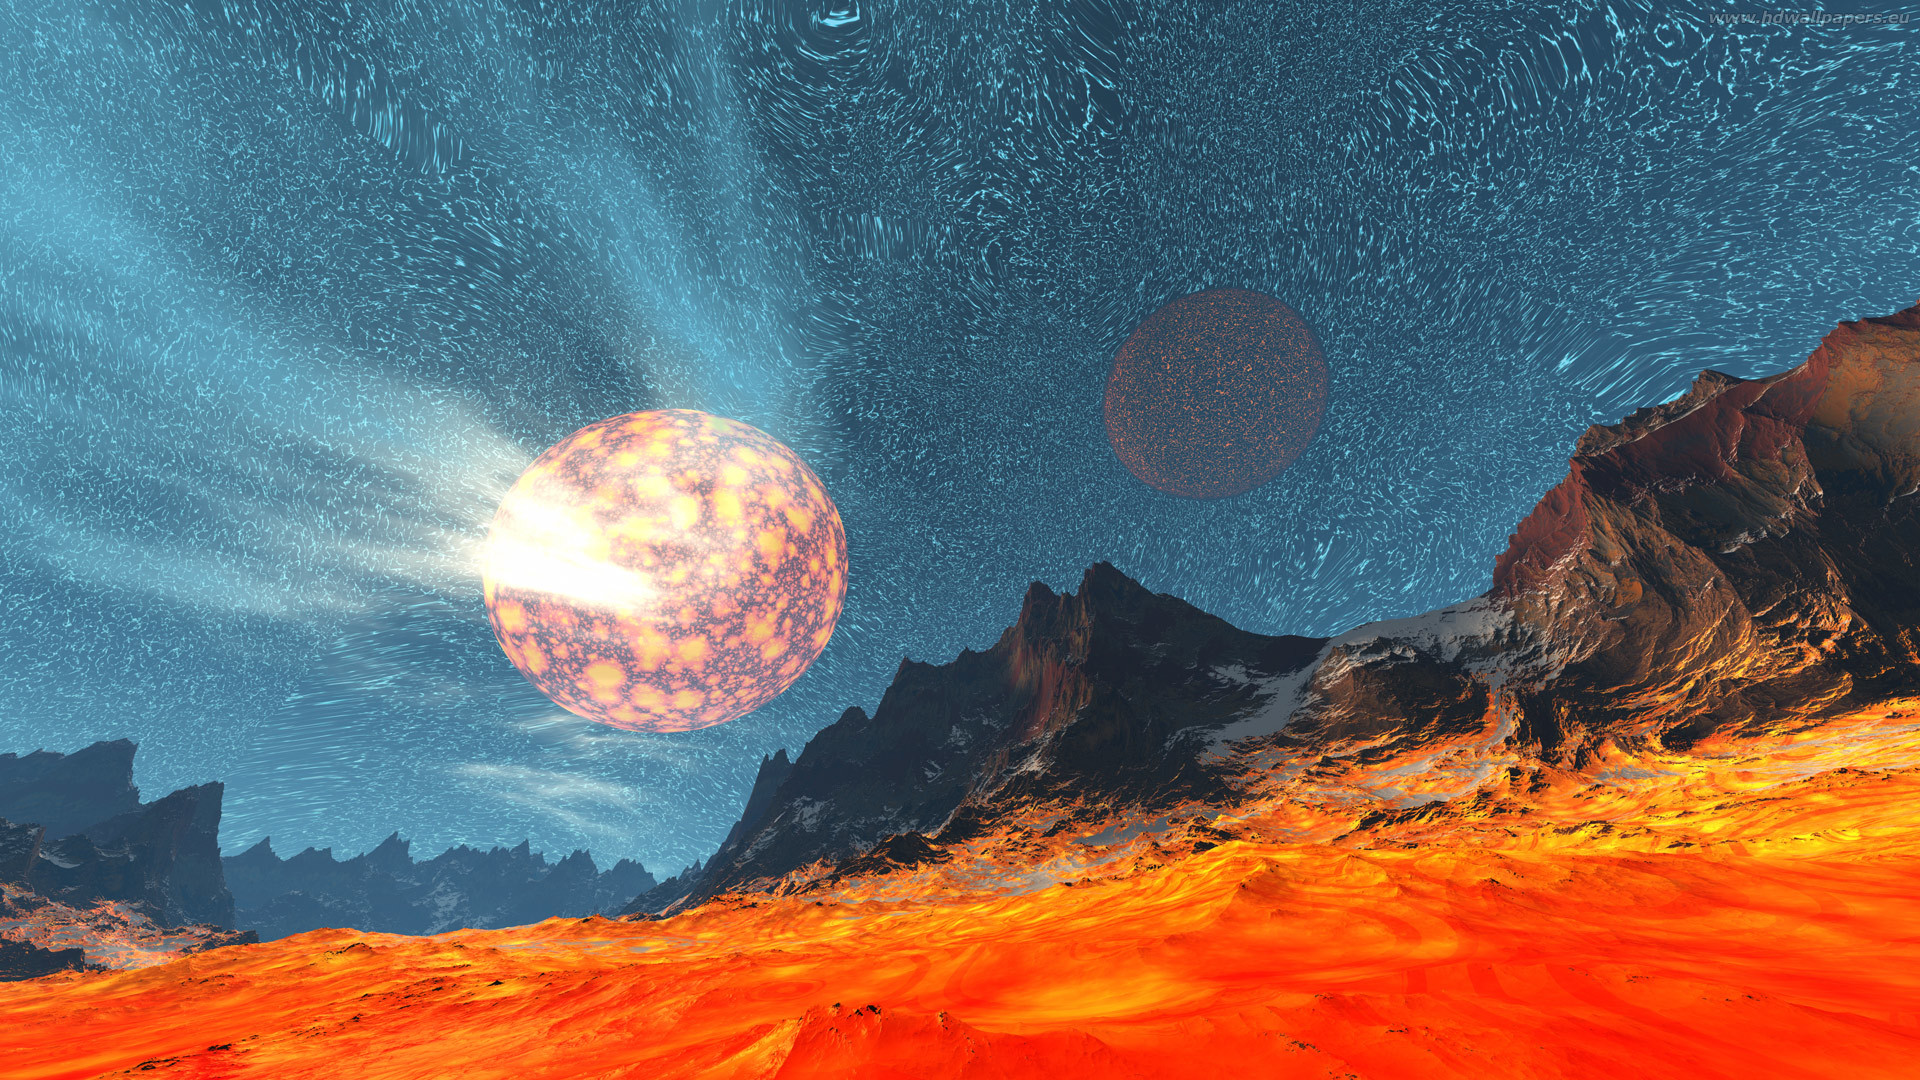 Science Fiction Wallpapers Sci Fi Wallpapers 2 Desktop: Retro Sci Fi Wallpaper (67+ Images